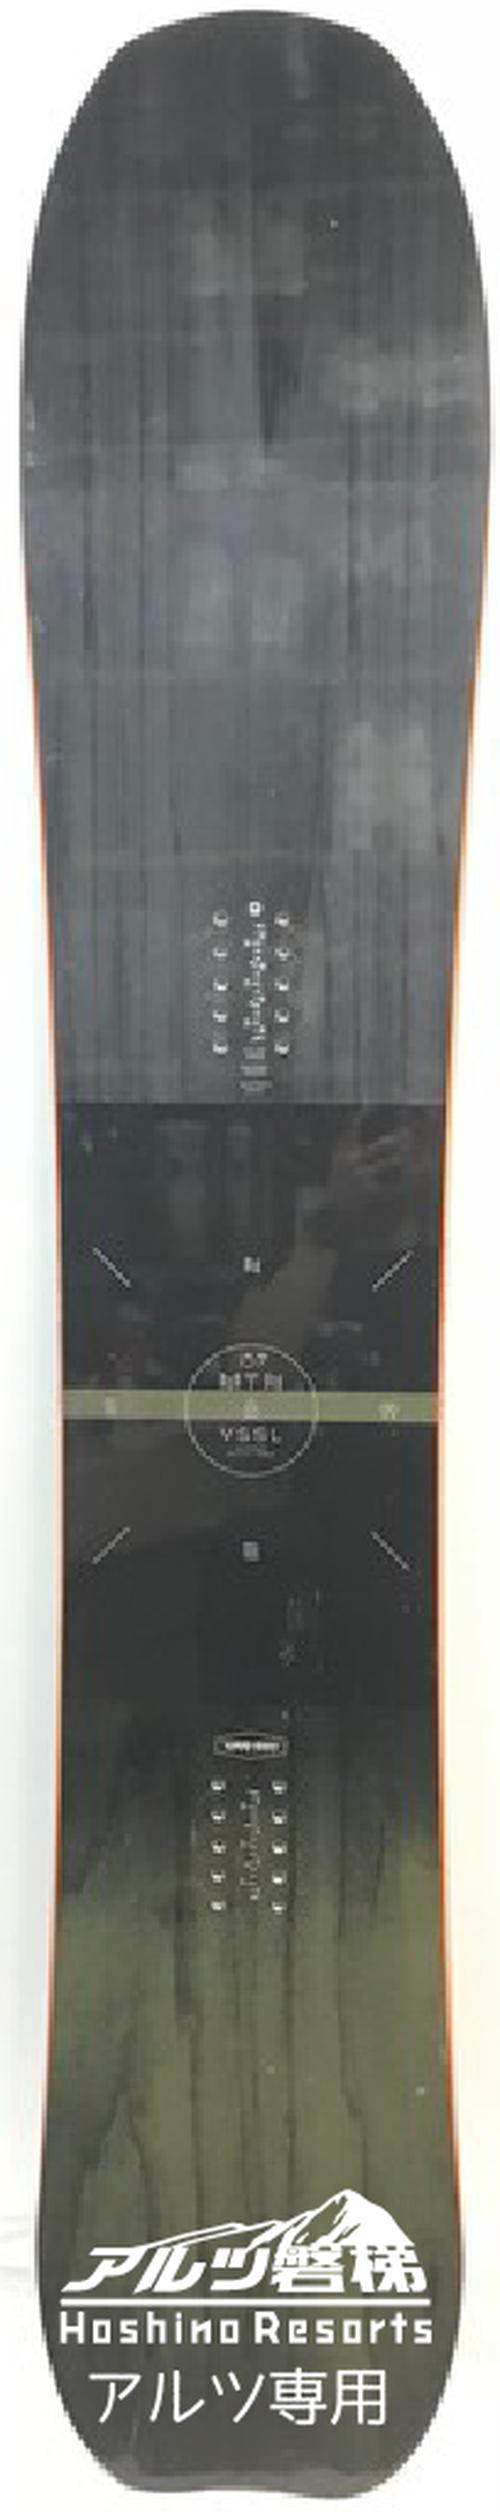 【NITRO-MOUNTAIN 157】1ヶ月レンタルプラン【アルツ磐梯・猫魔】